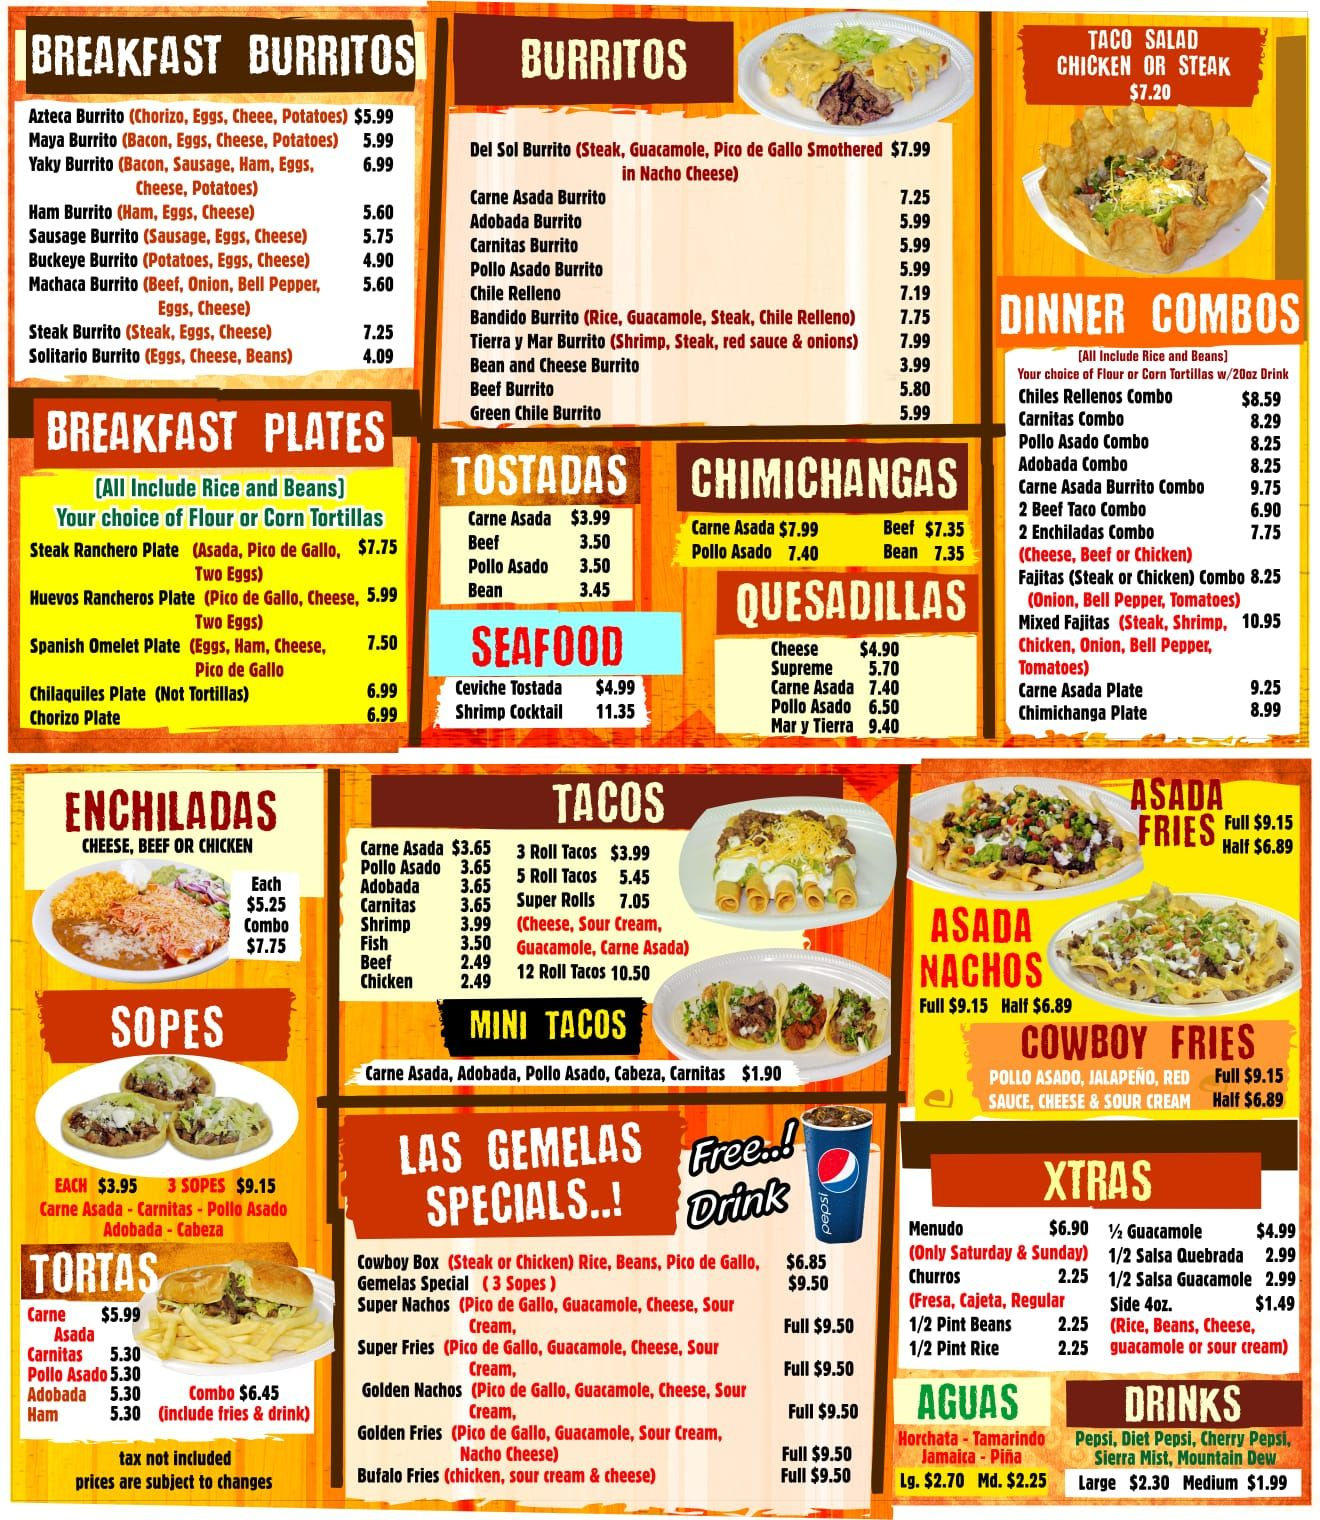 Las Gemelas Mexican Food